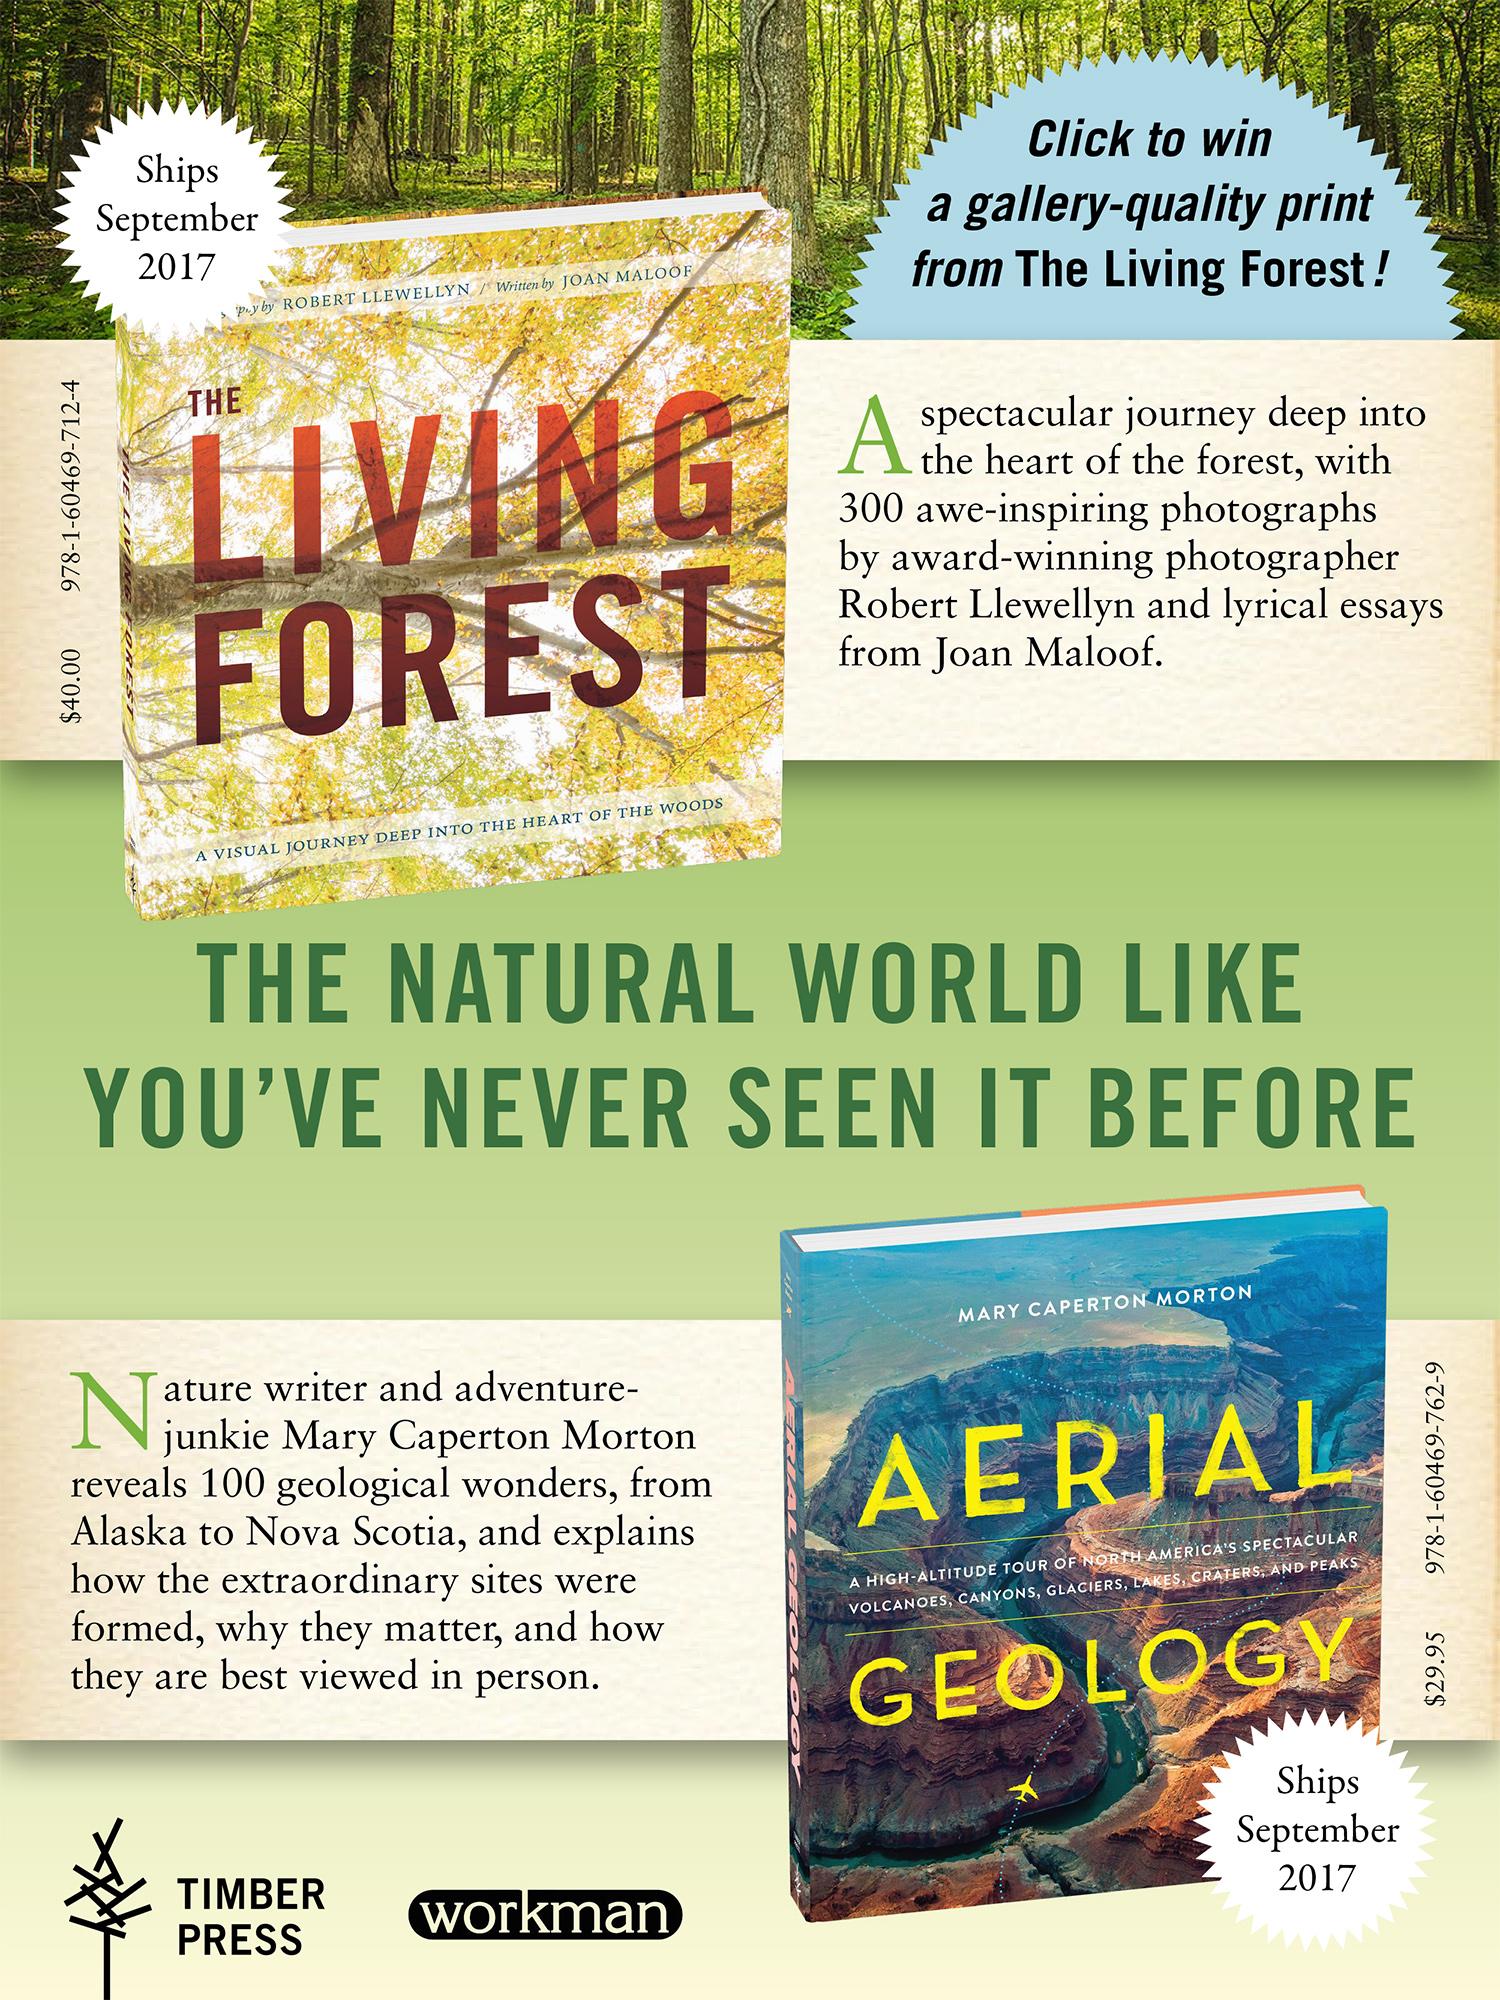 NaturalWorldBooklist-eBlast_final.jpg